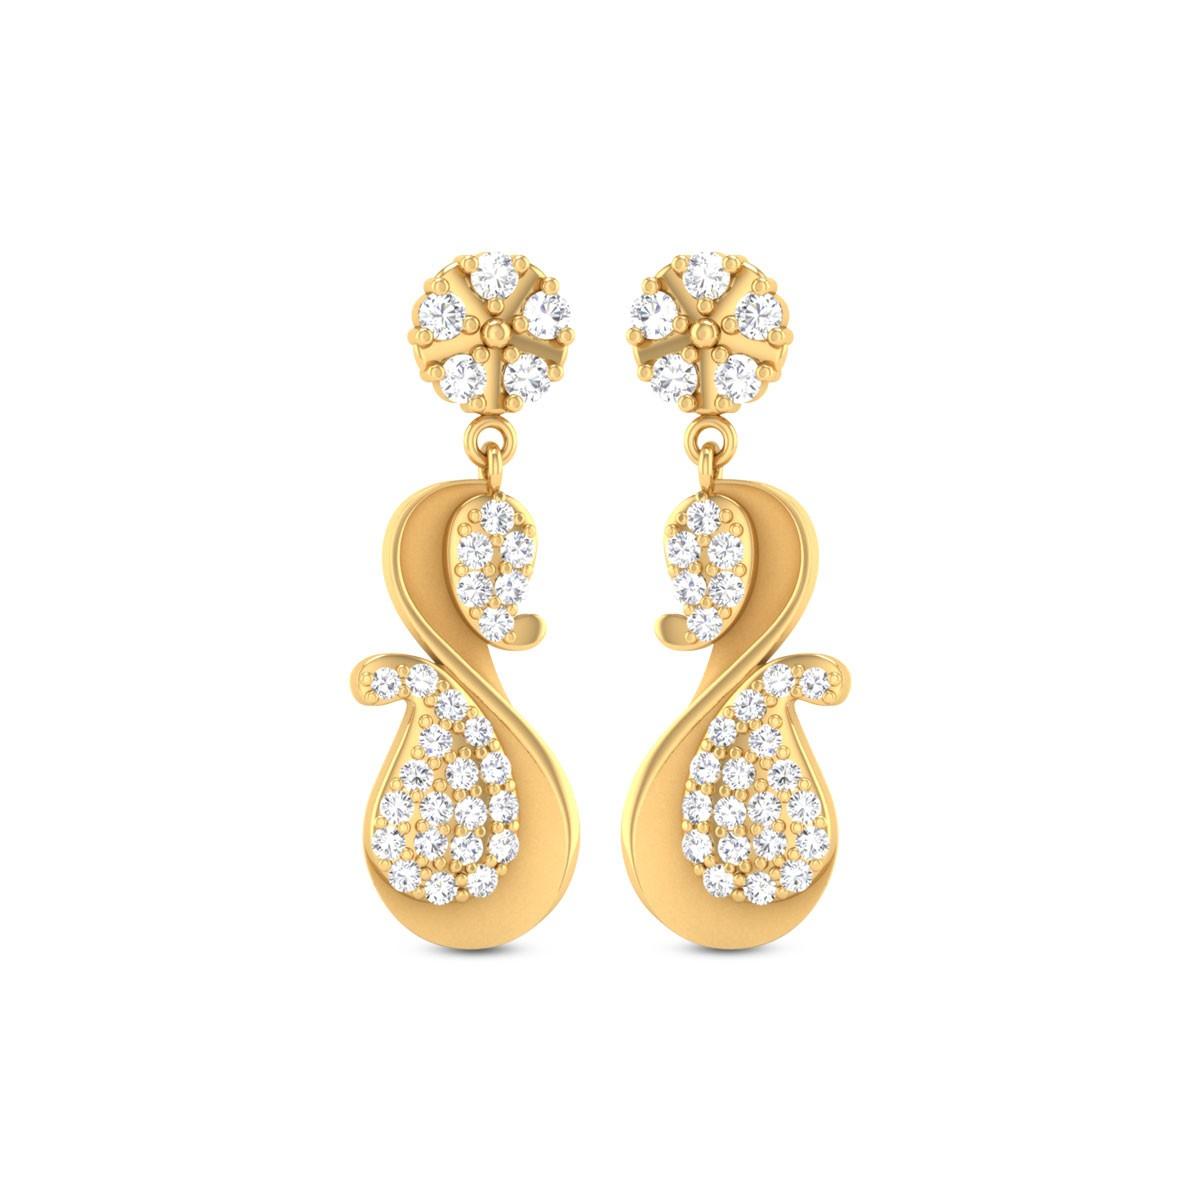 Cate Gold & CZ Earrings